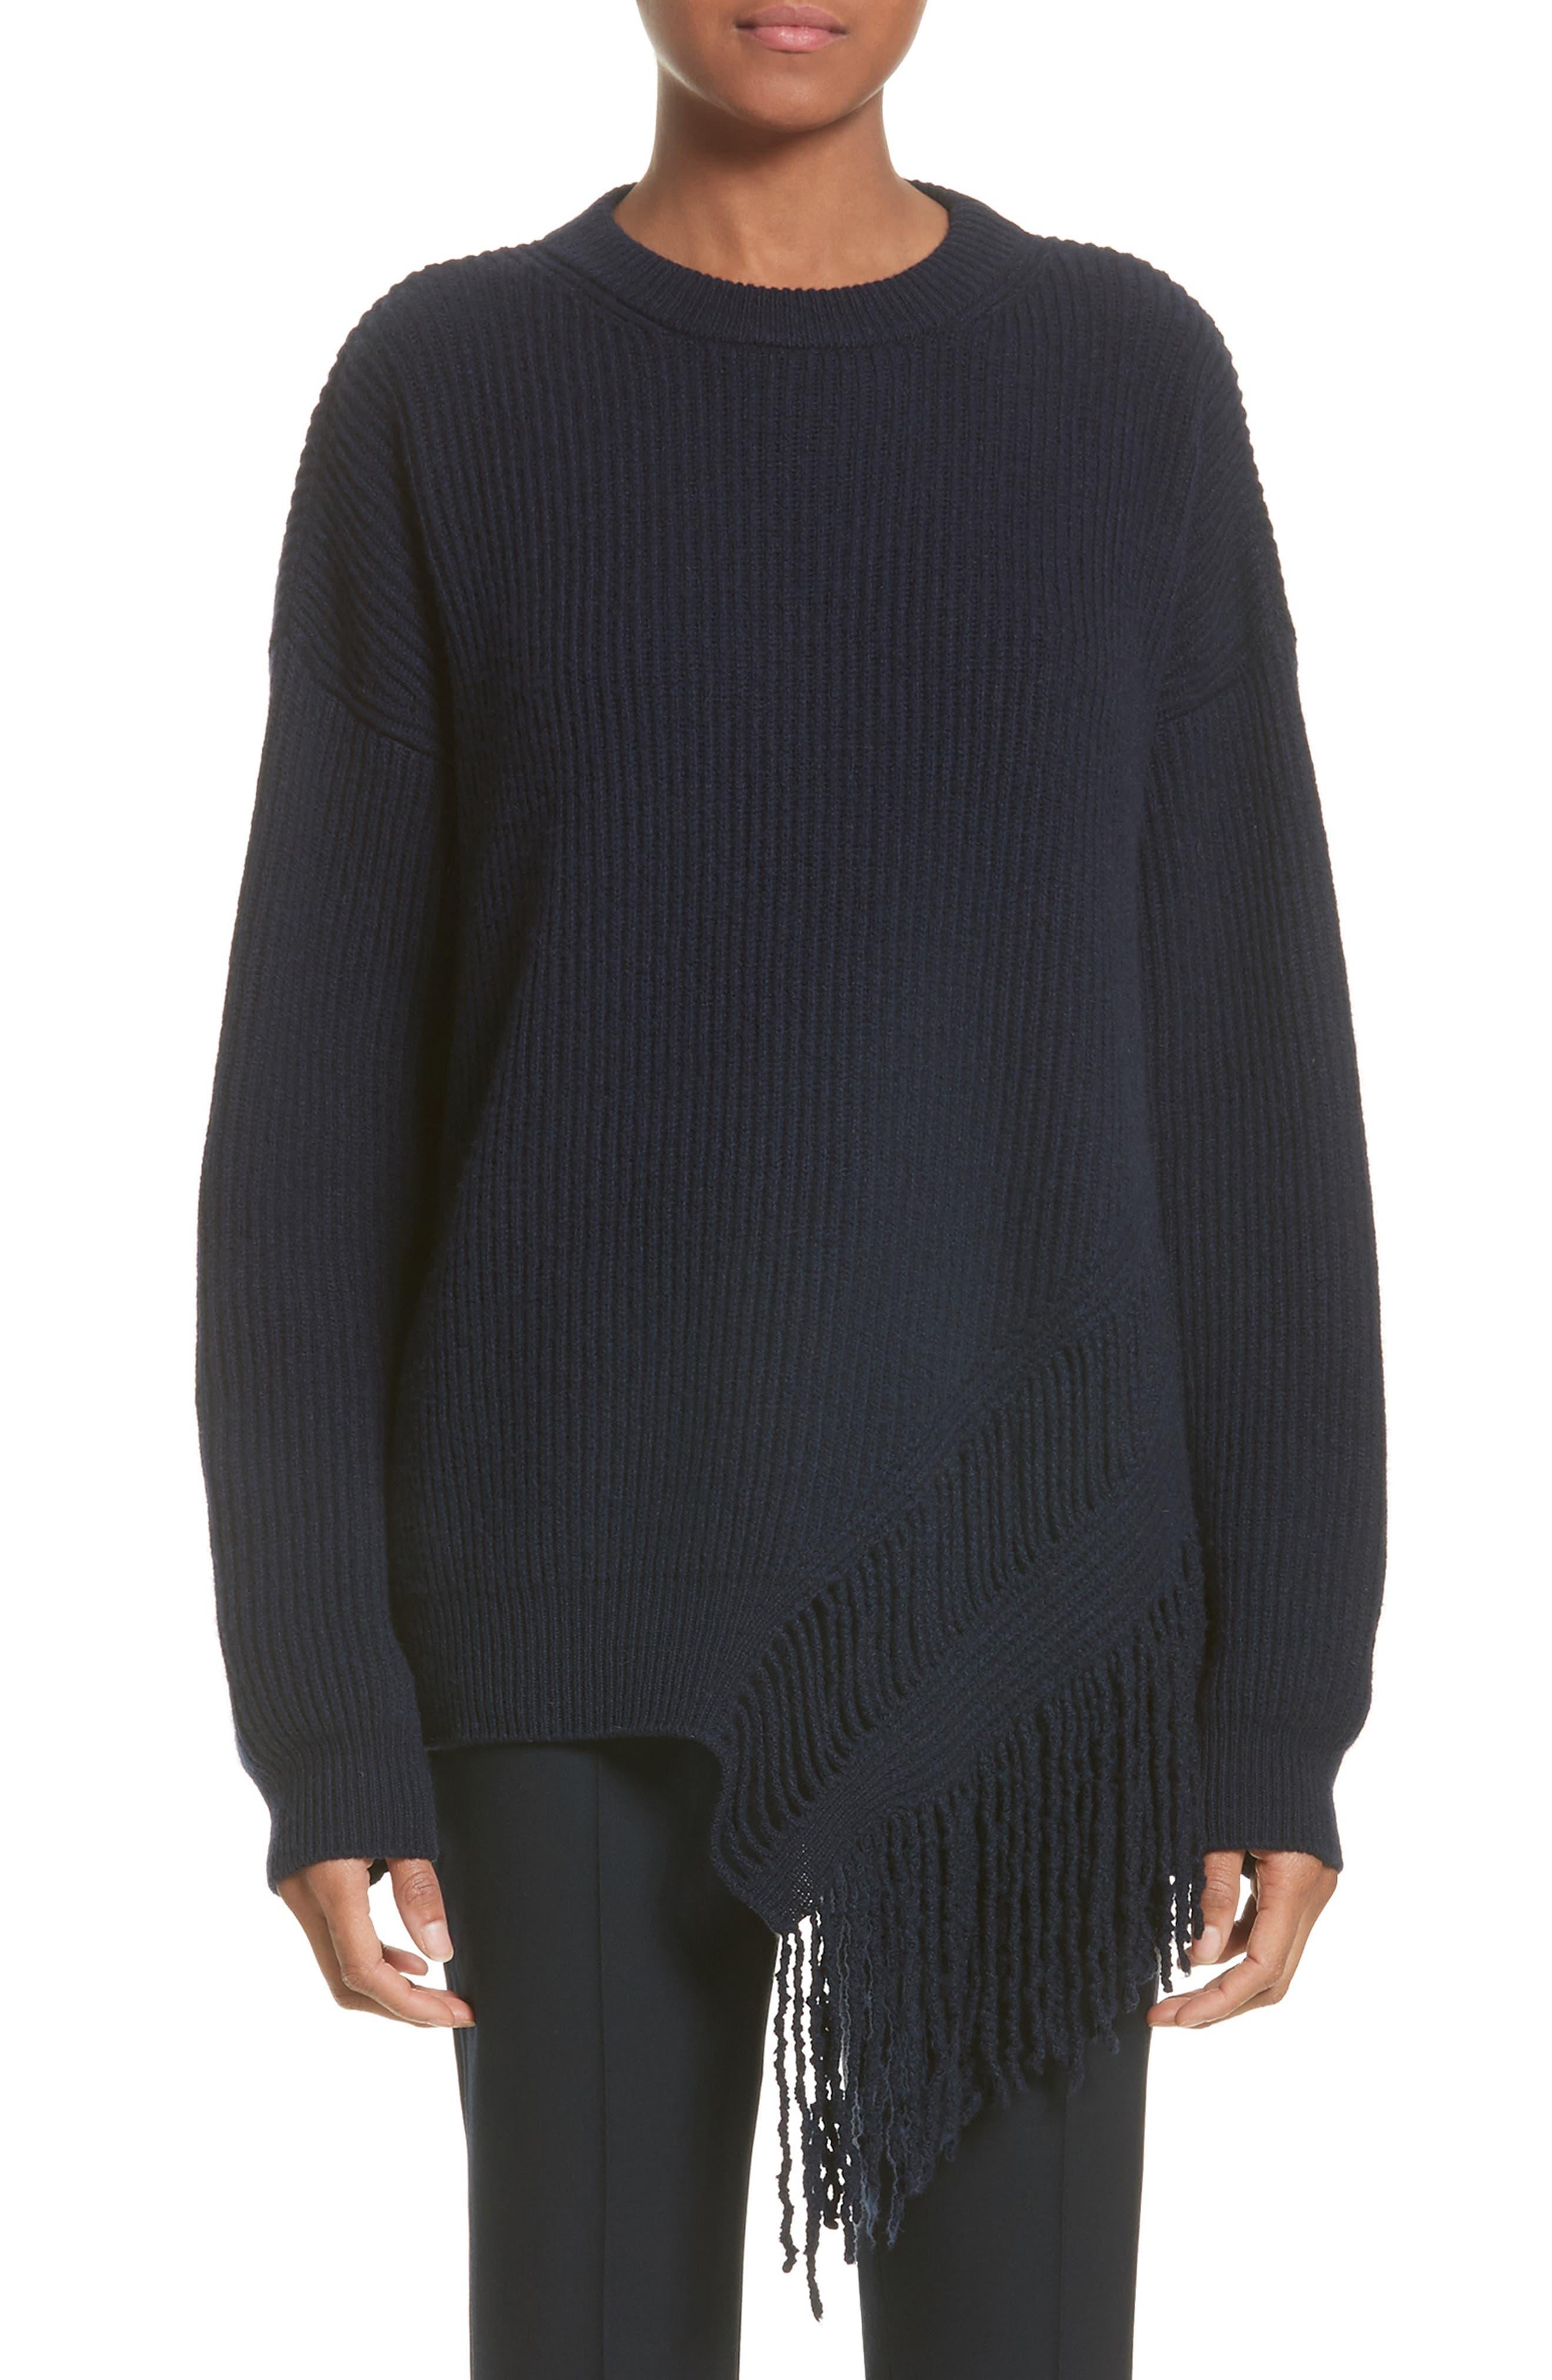 Stella McCartney Cashmere & Wool Fringe Sweater